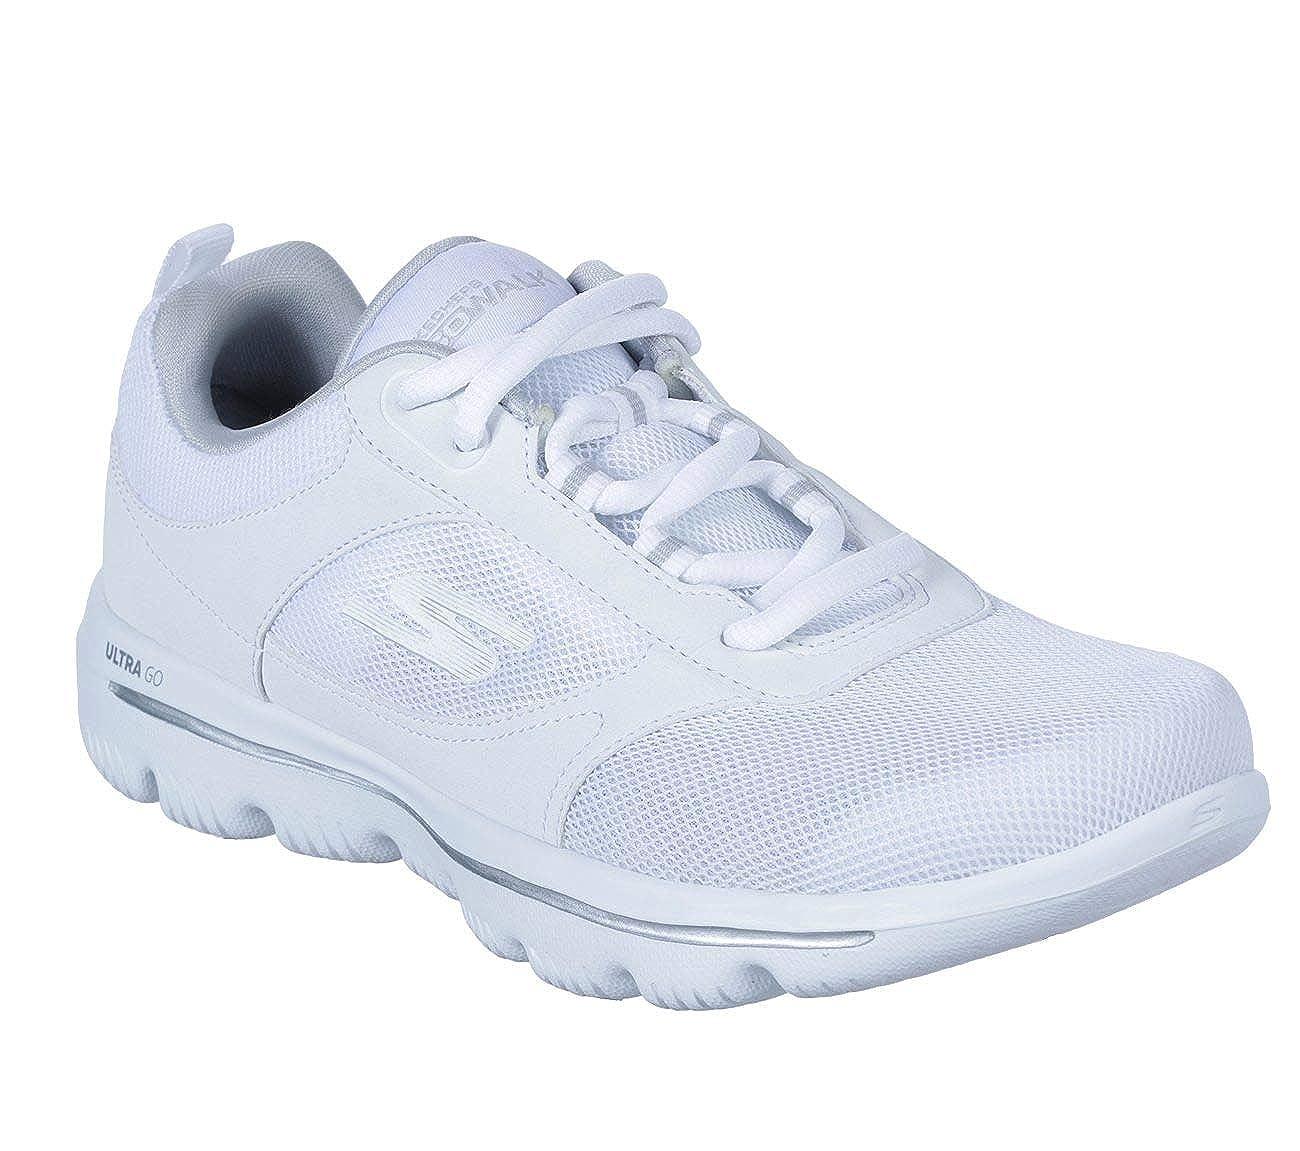 Meistverkauft Skechers Damen Schwarz Schuhe Keil Sneaker